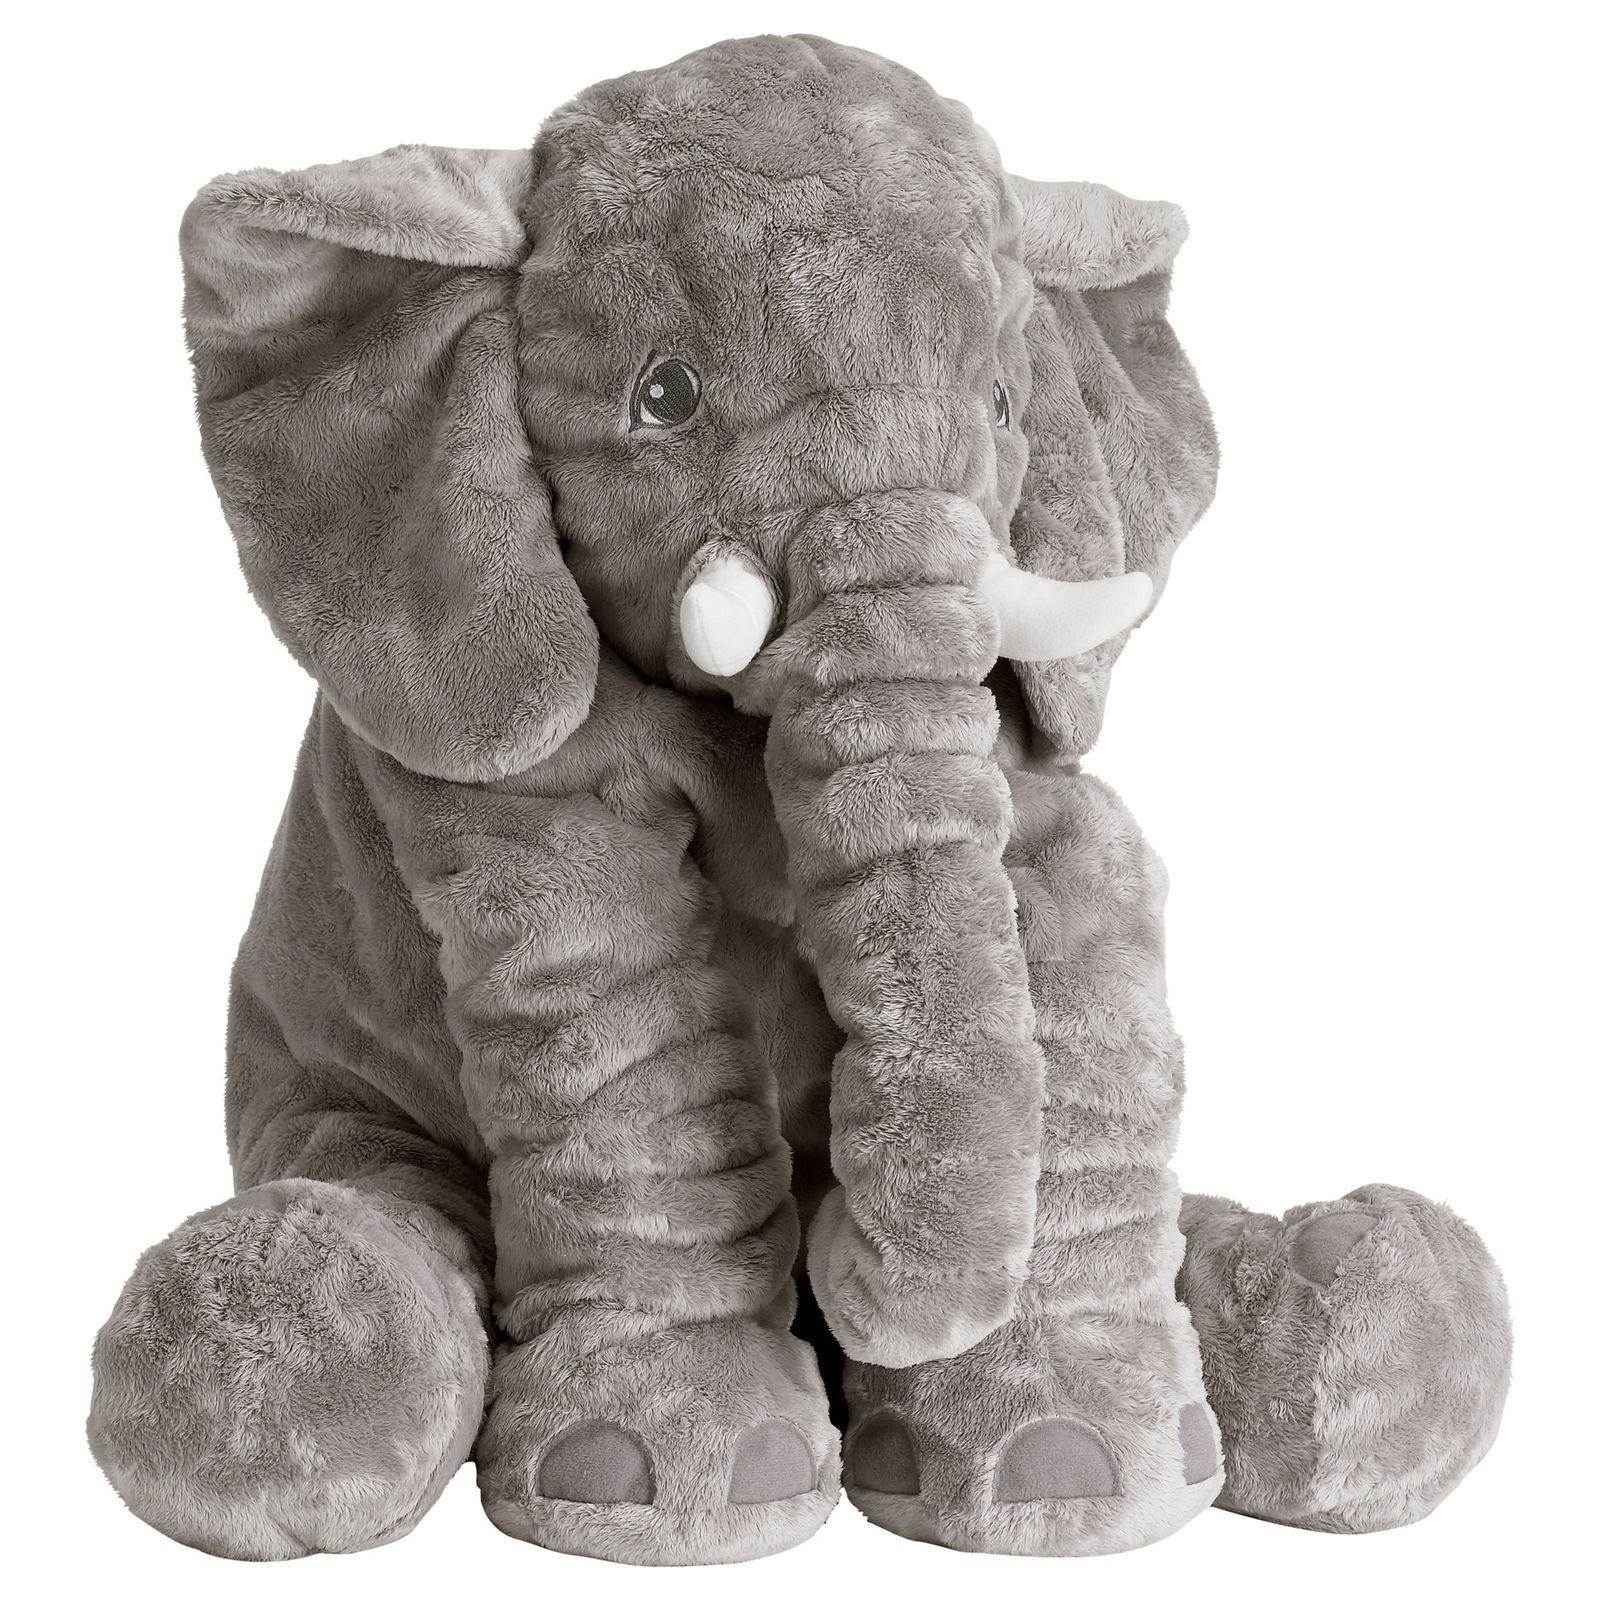 New IKEA JATTESTOR Large Jumbo Elephant Stuffed Animal Plush